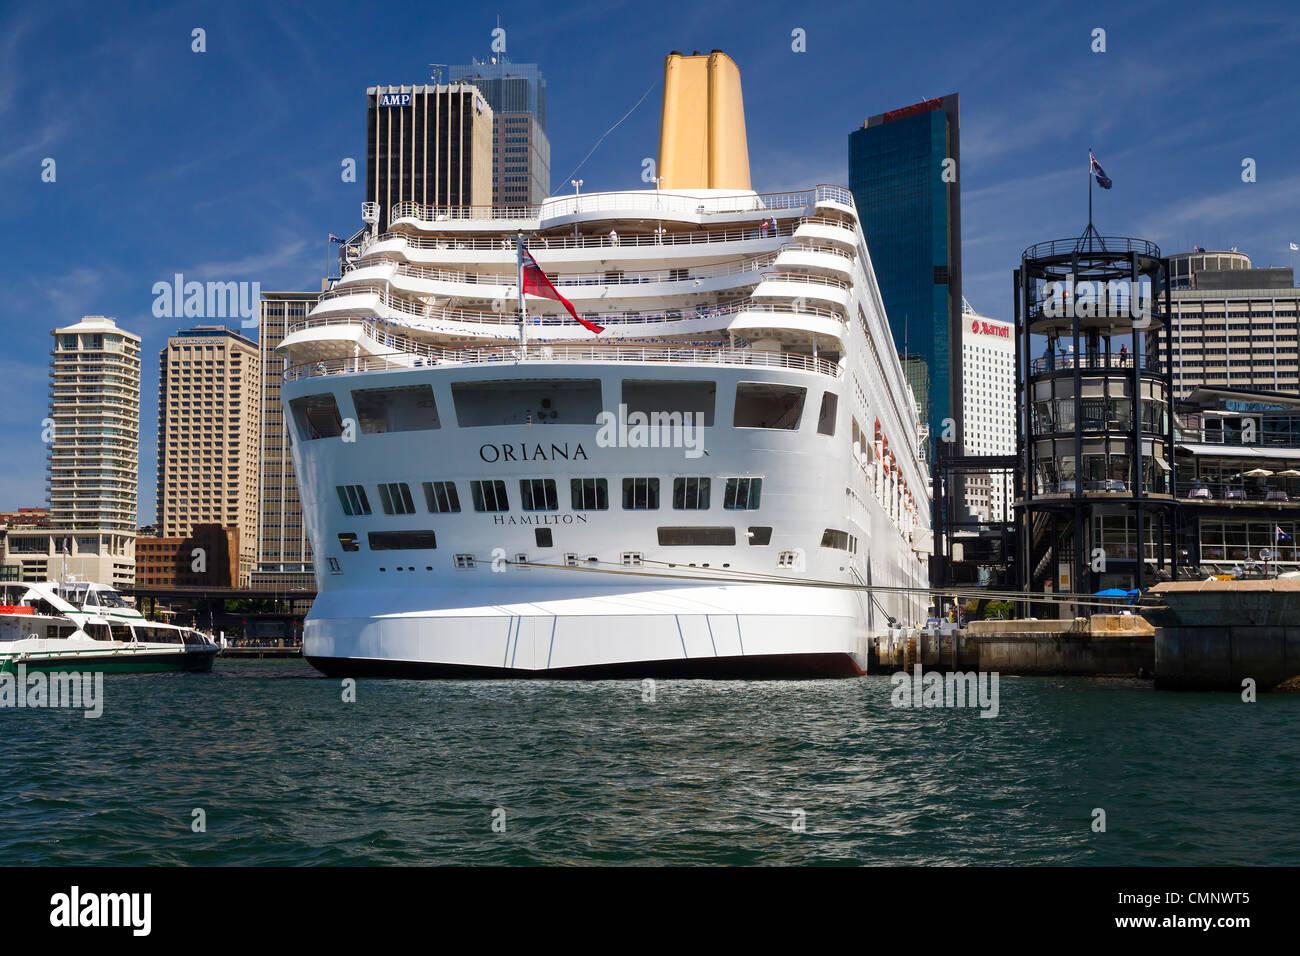 Cruise Ship  P & O Oriana moored at Circular Quay Sydney - Stock Image